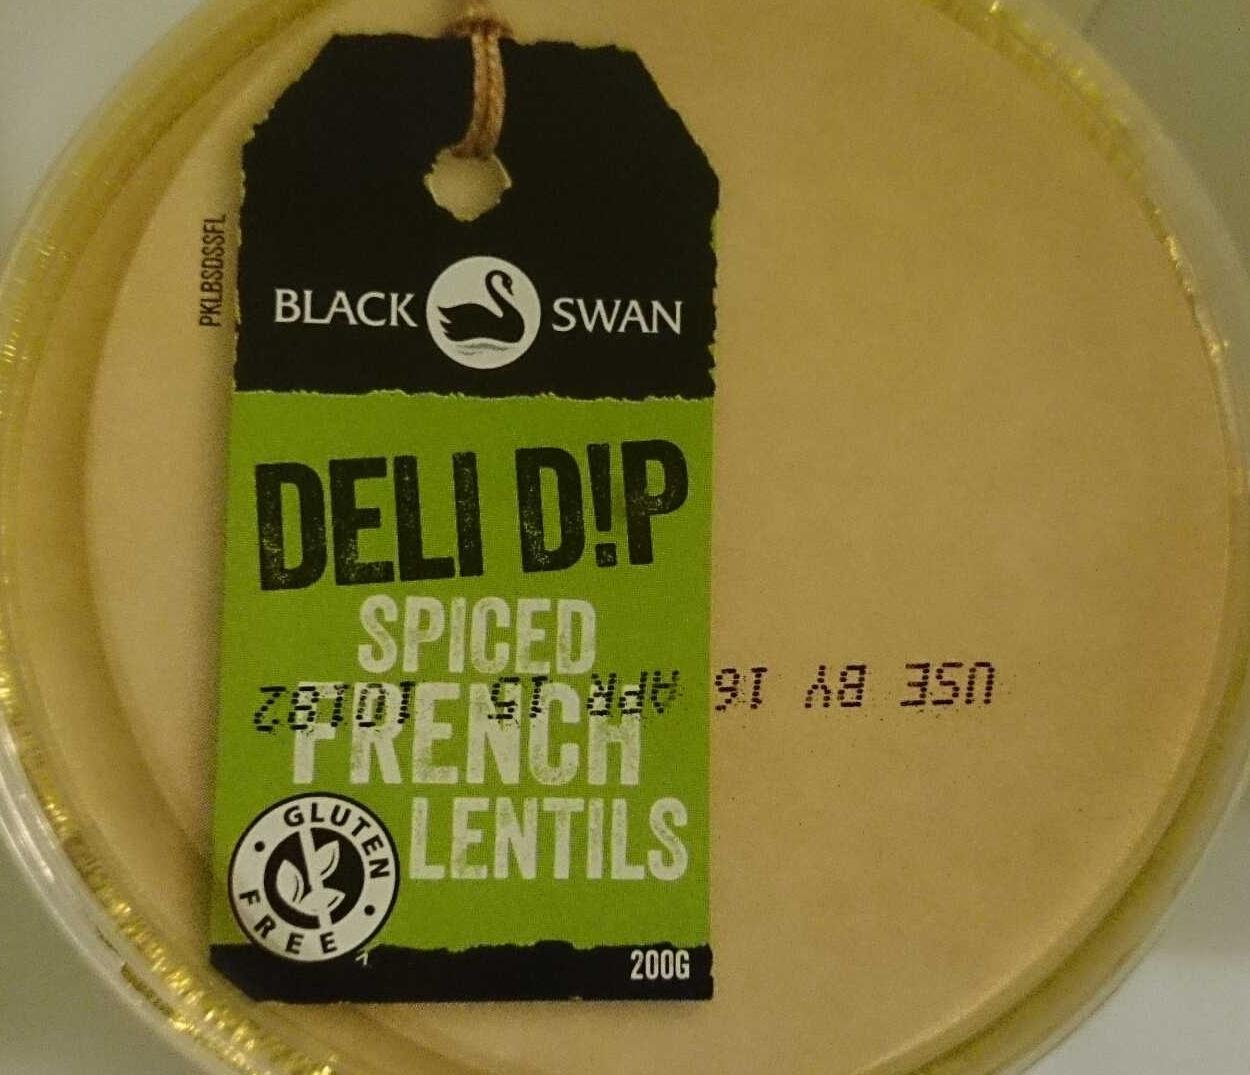 Spiced French Lentils Deli Dip - Product - en